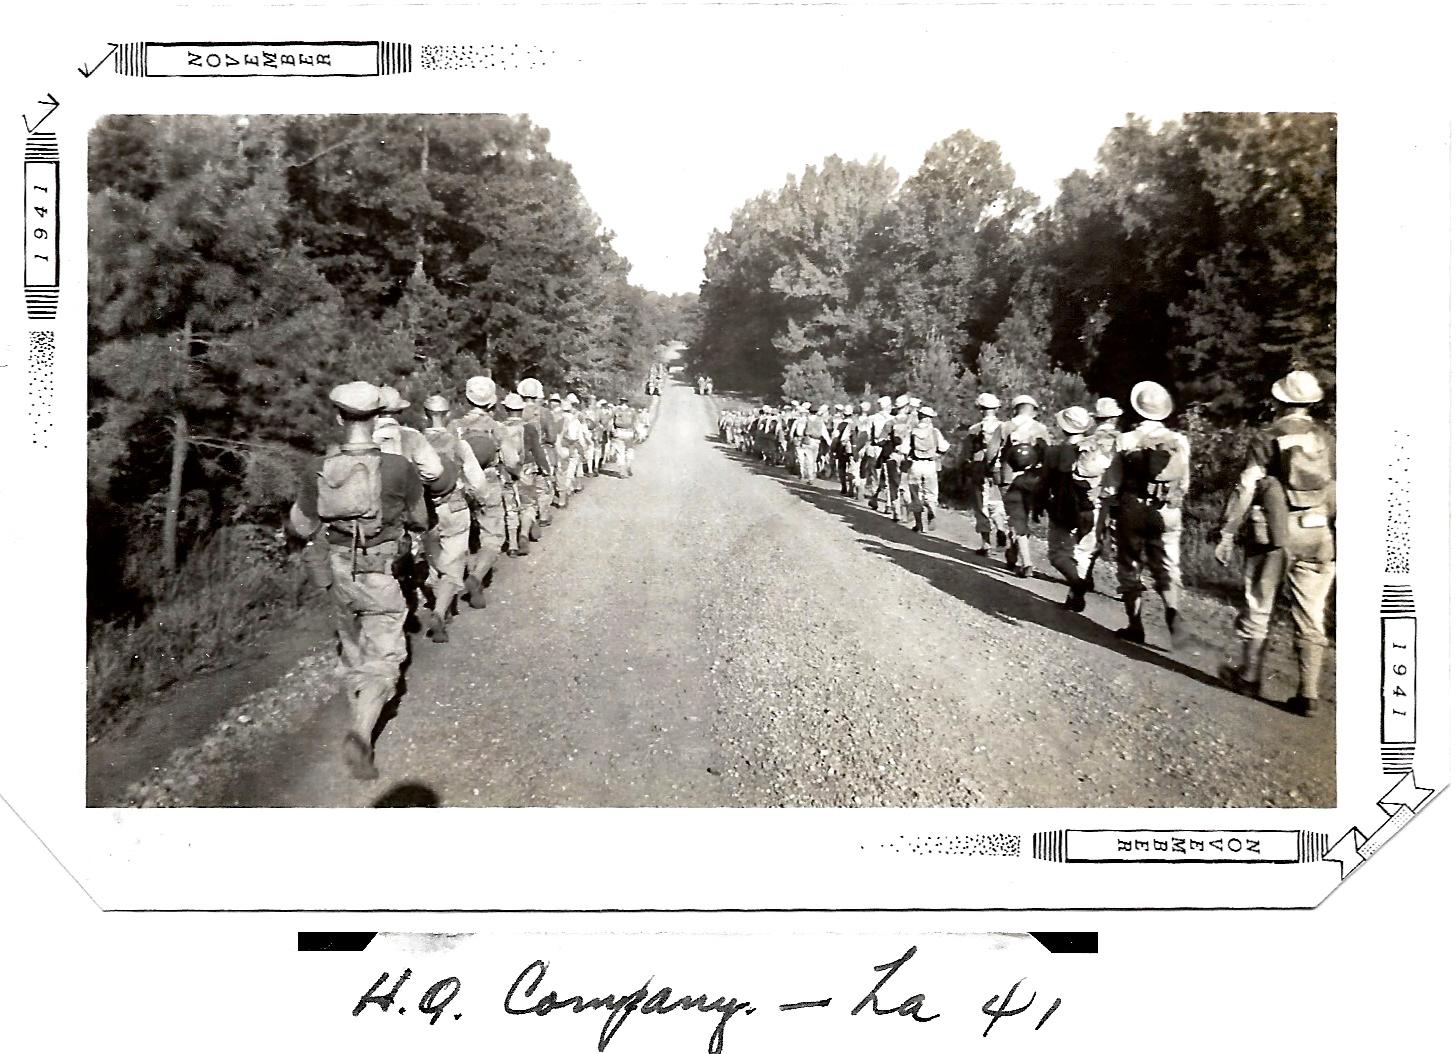 1941 WWII Louisiana Maneuvers HQ Company